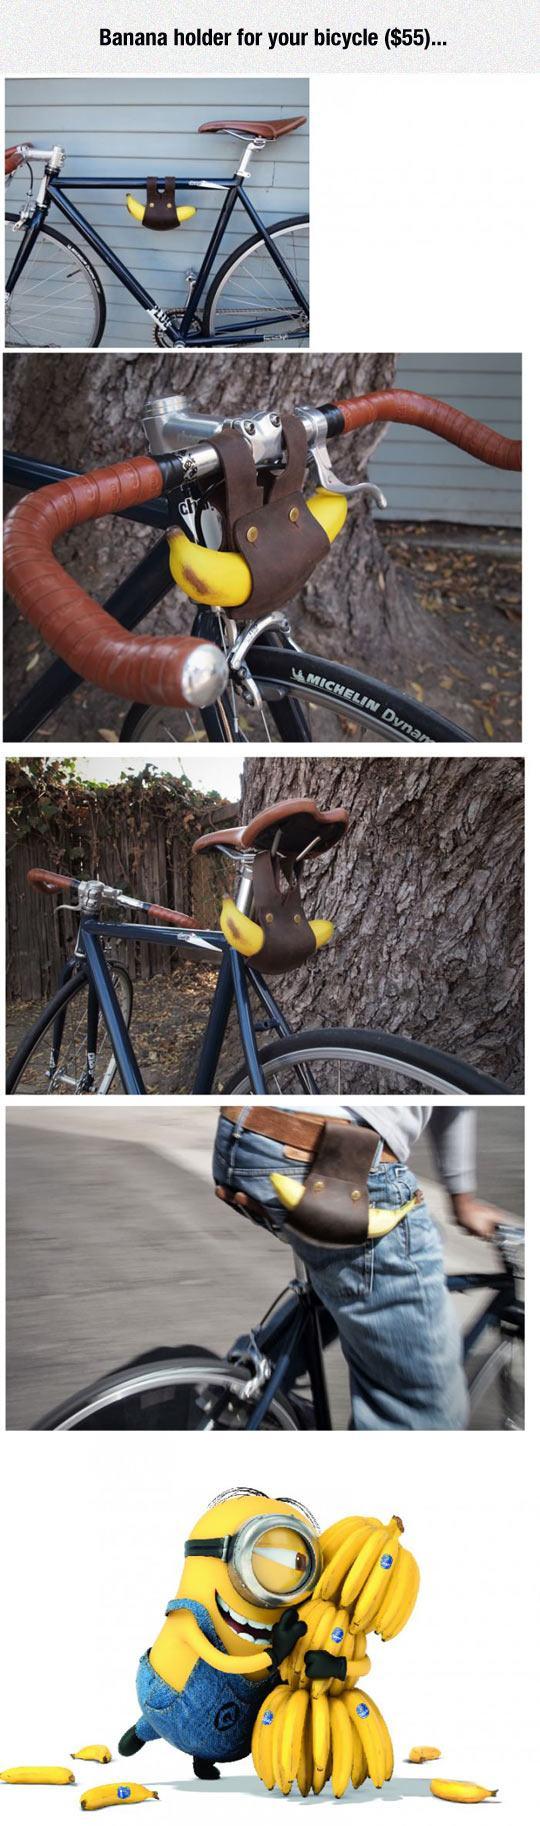 funny-banana-holder-bicycle-price-1